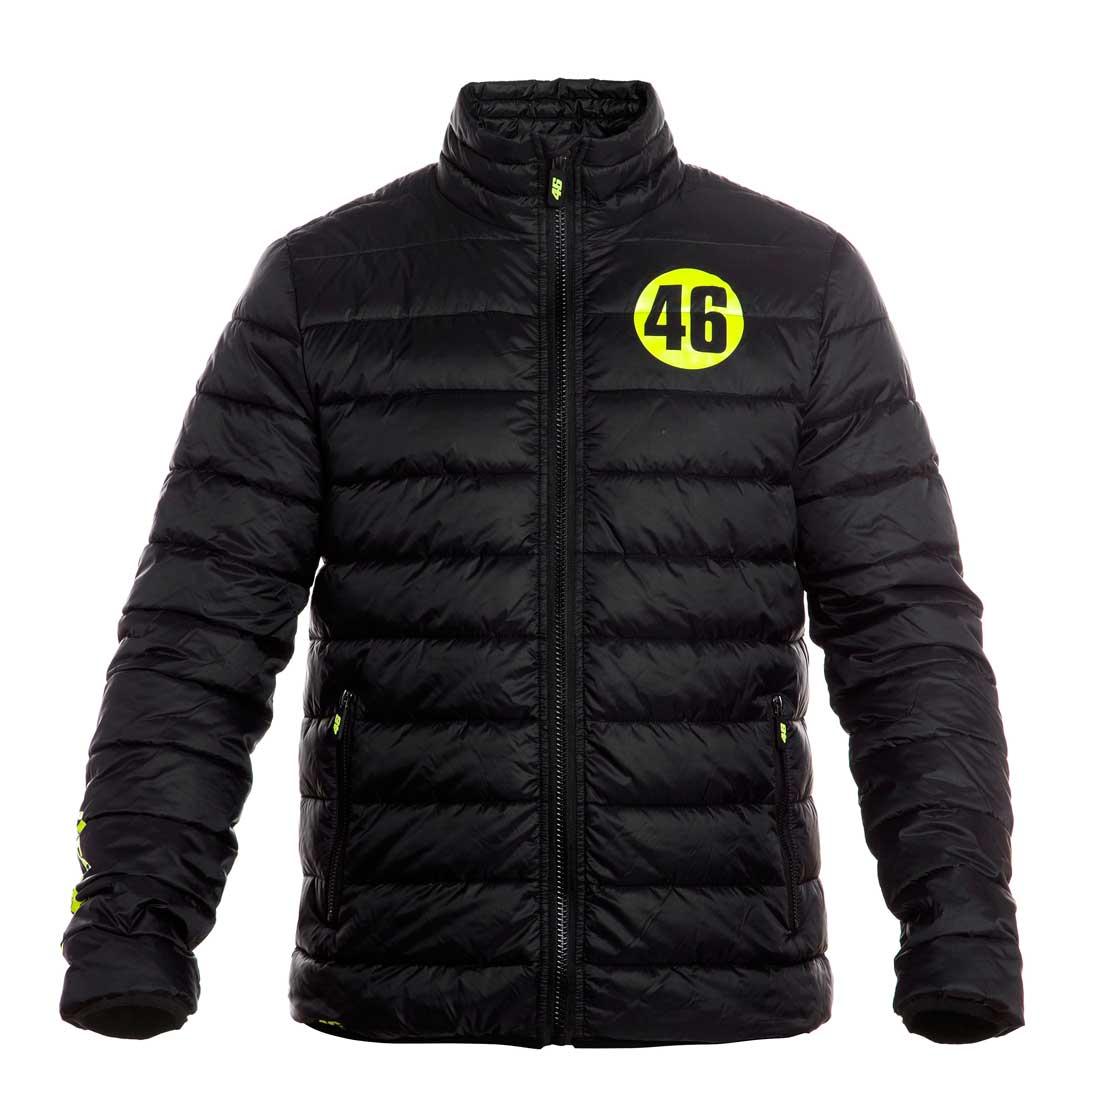 VR46(バレンティーノロッシ)46 padded jacket